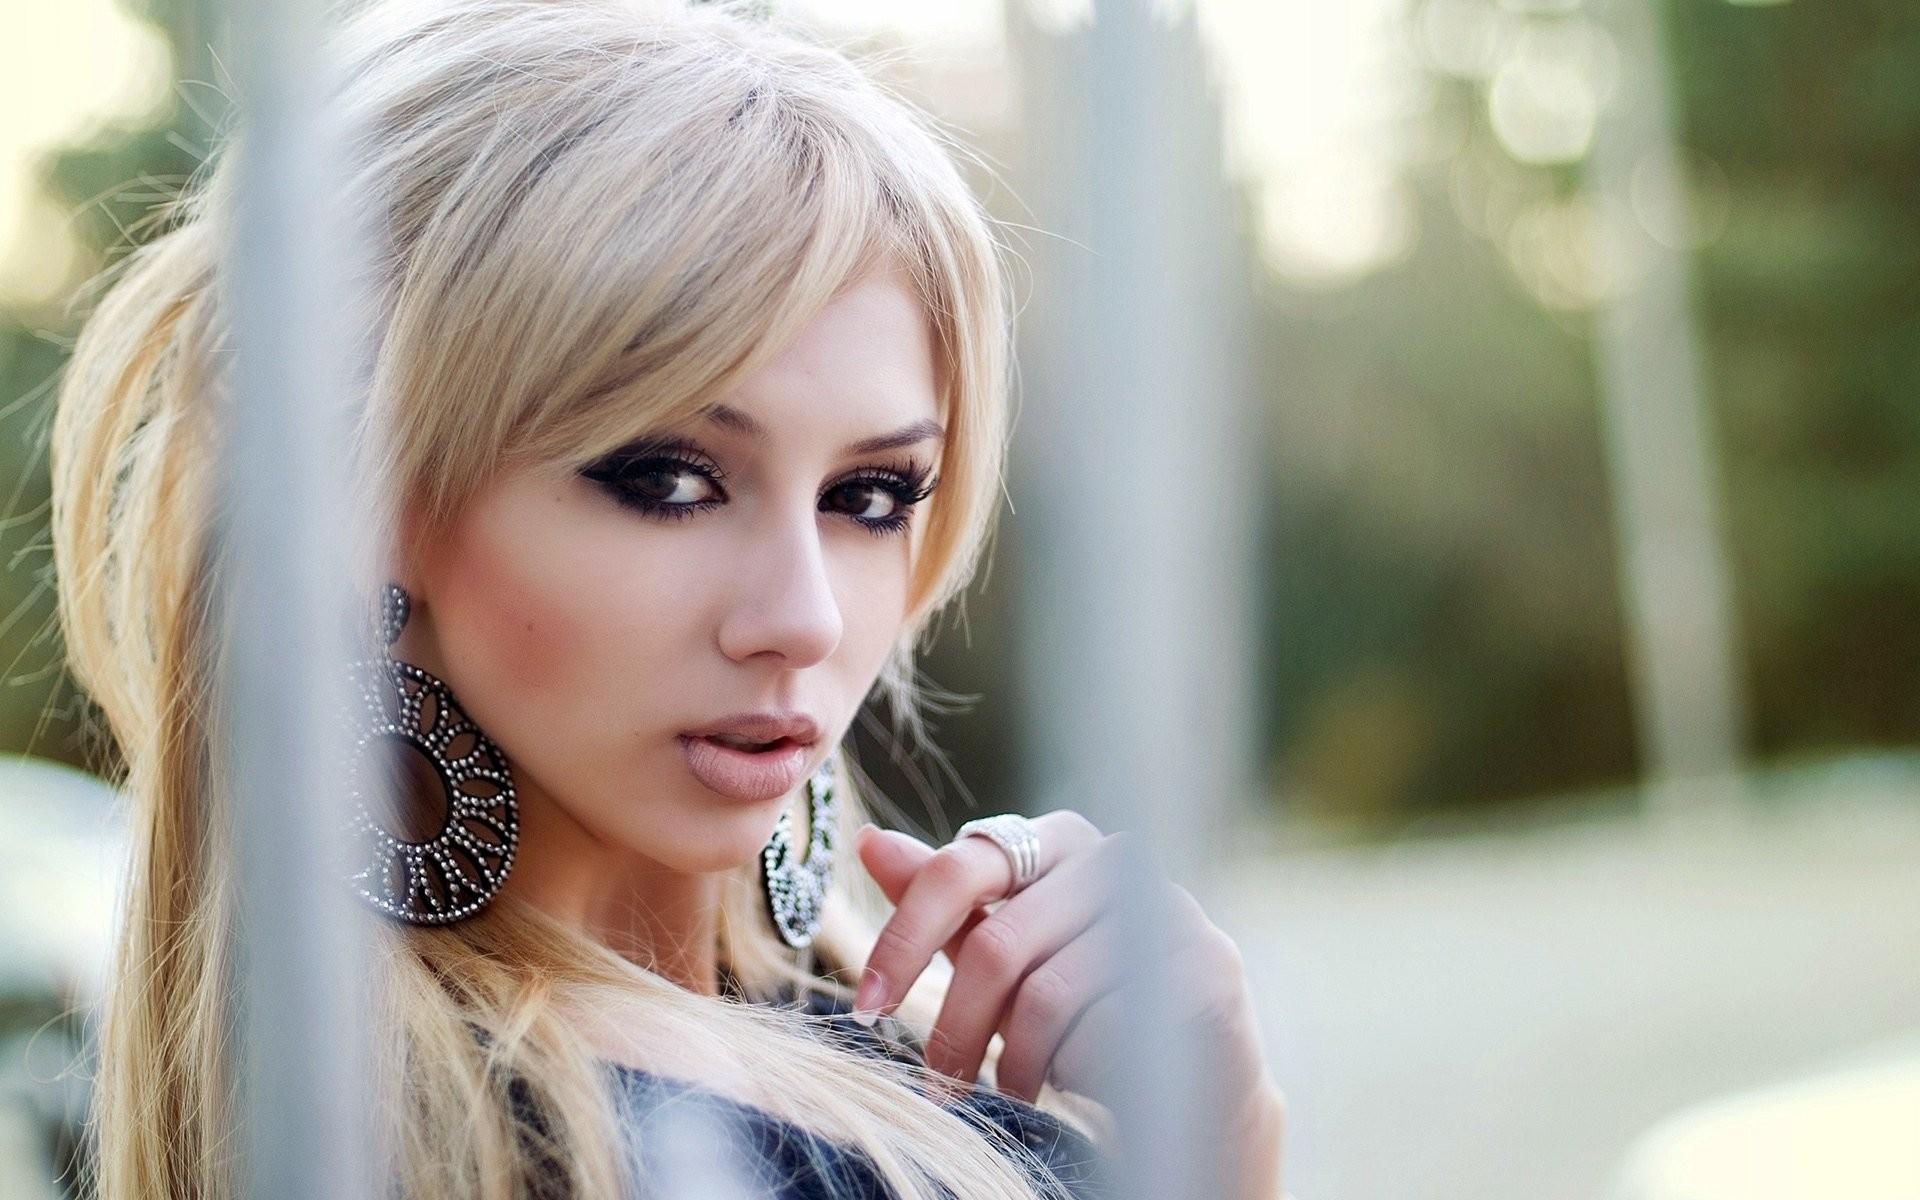 Wallpaper : Face, Women Outdoors, Model, Blonde, Depth Of